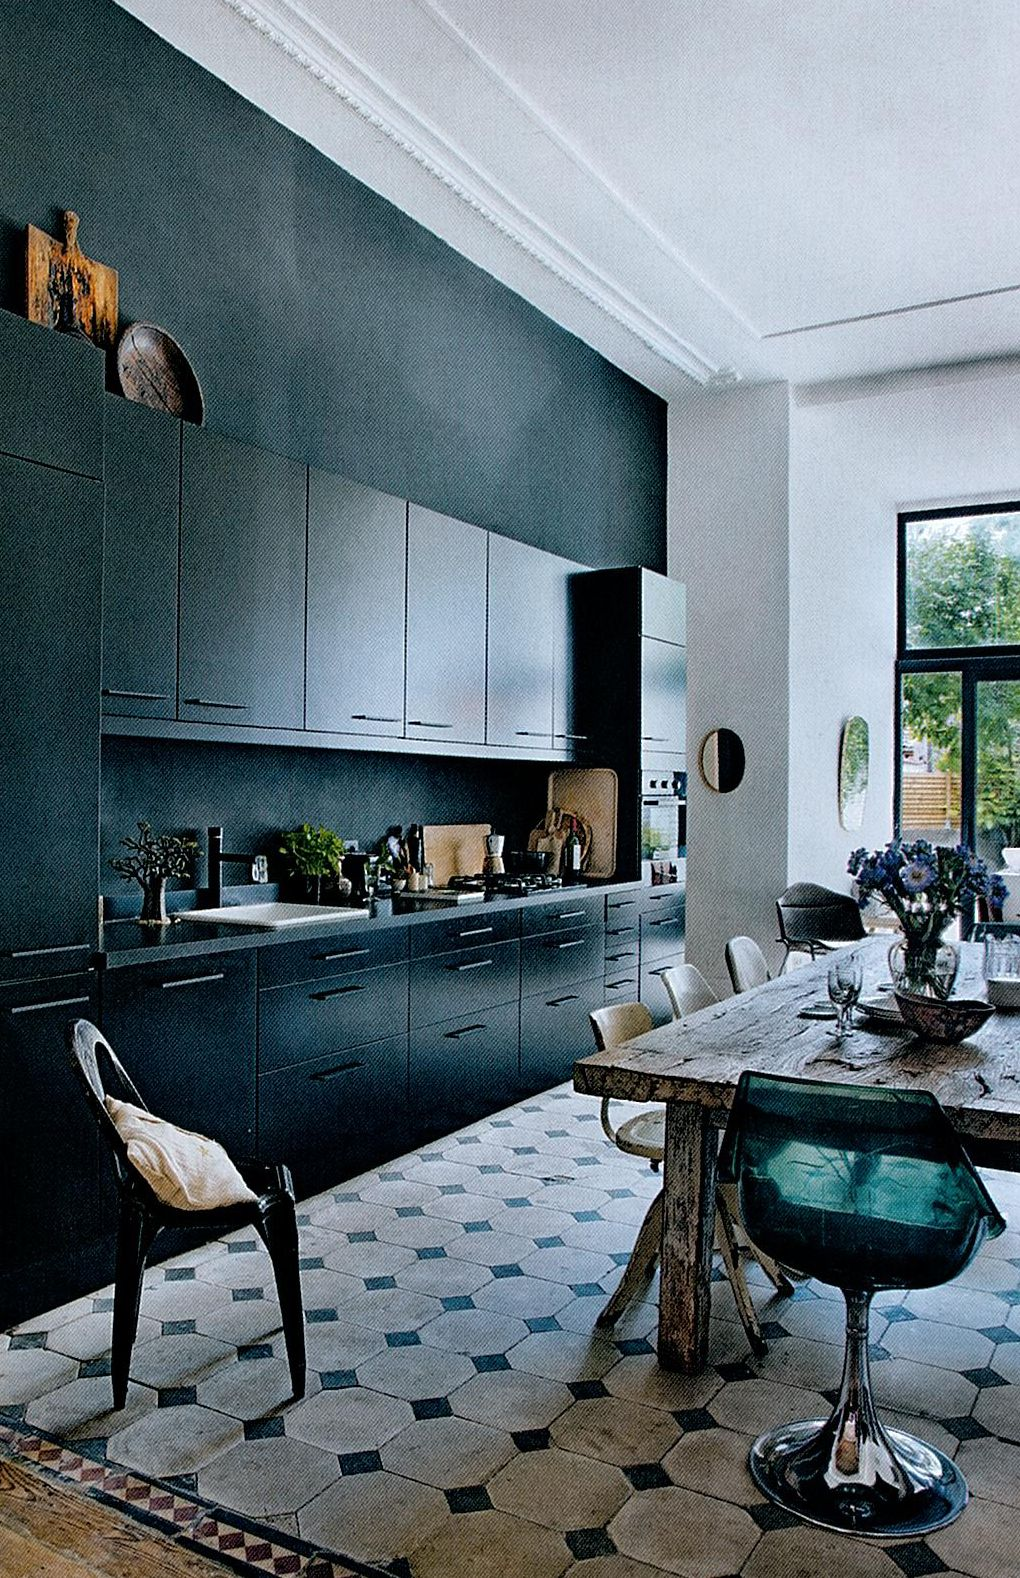 53 Stylish Black Kitchen Designs   Pinterest   Kitchens, Kitchen ...